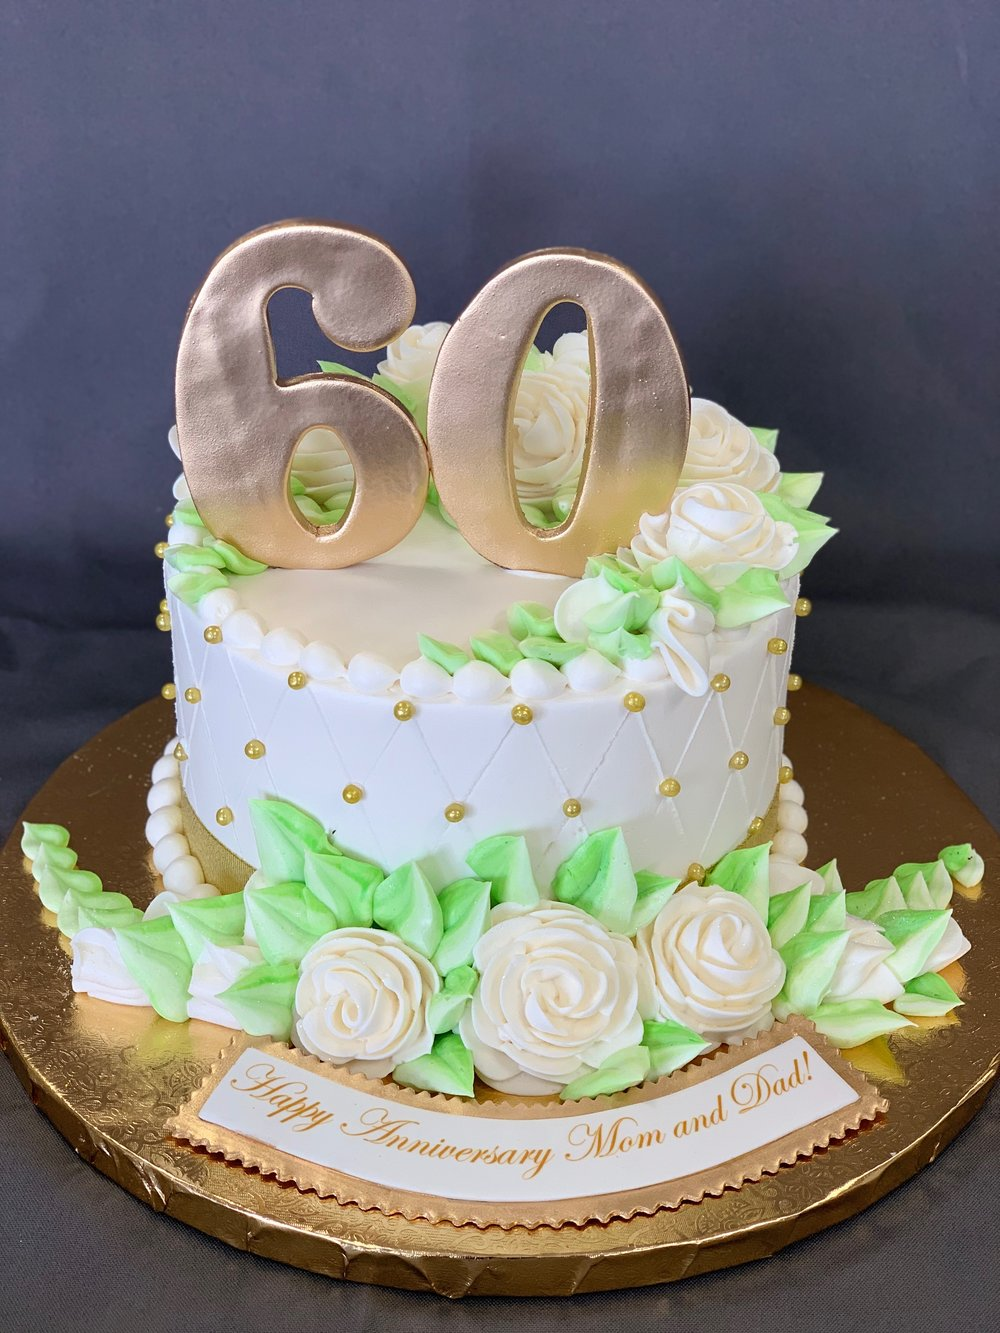 Outstanding 60Th Birthday Cake Skazka Desserts Bakery Nj Custom Birthday Funny Birthday Cards Online Alyptdamsfinfo